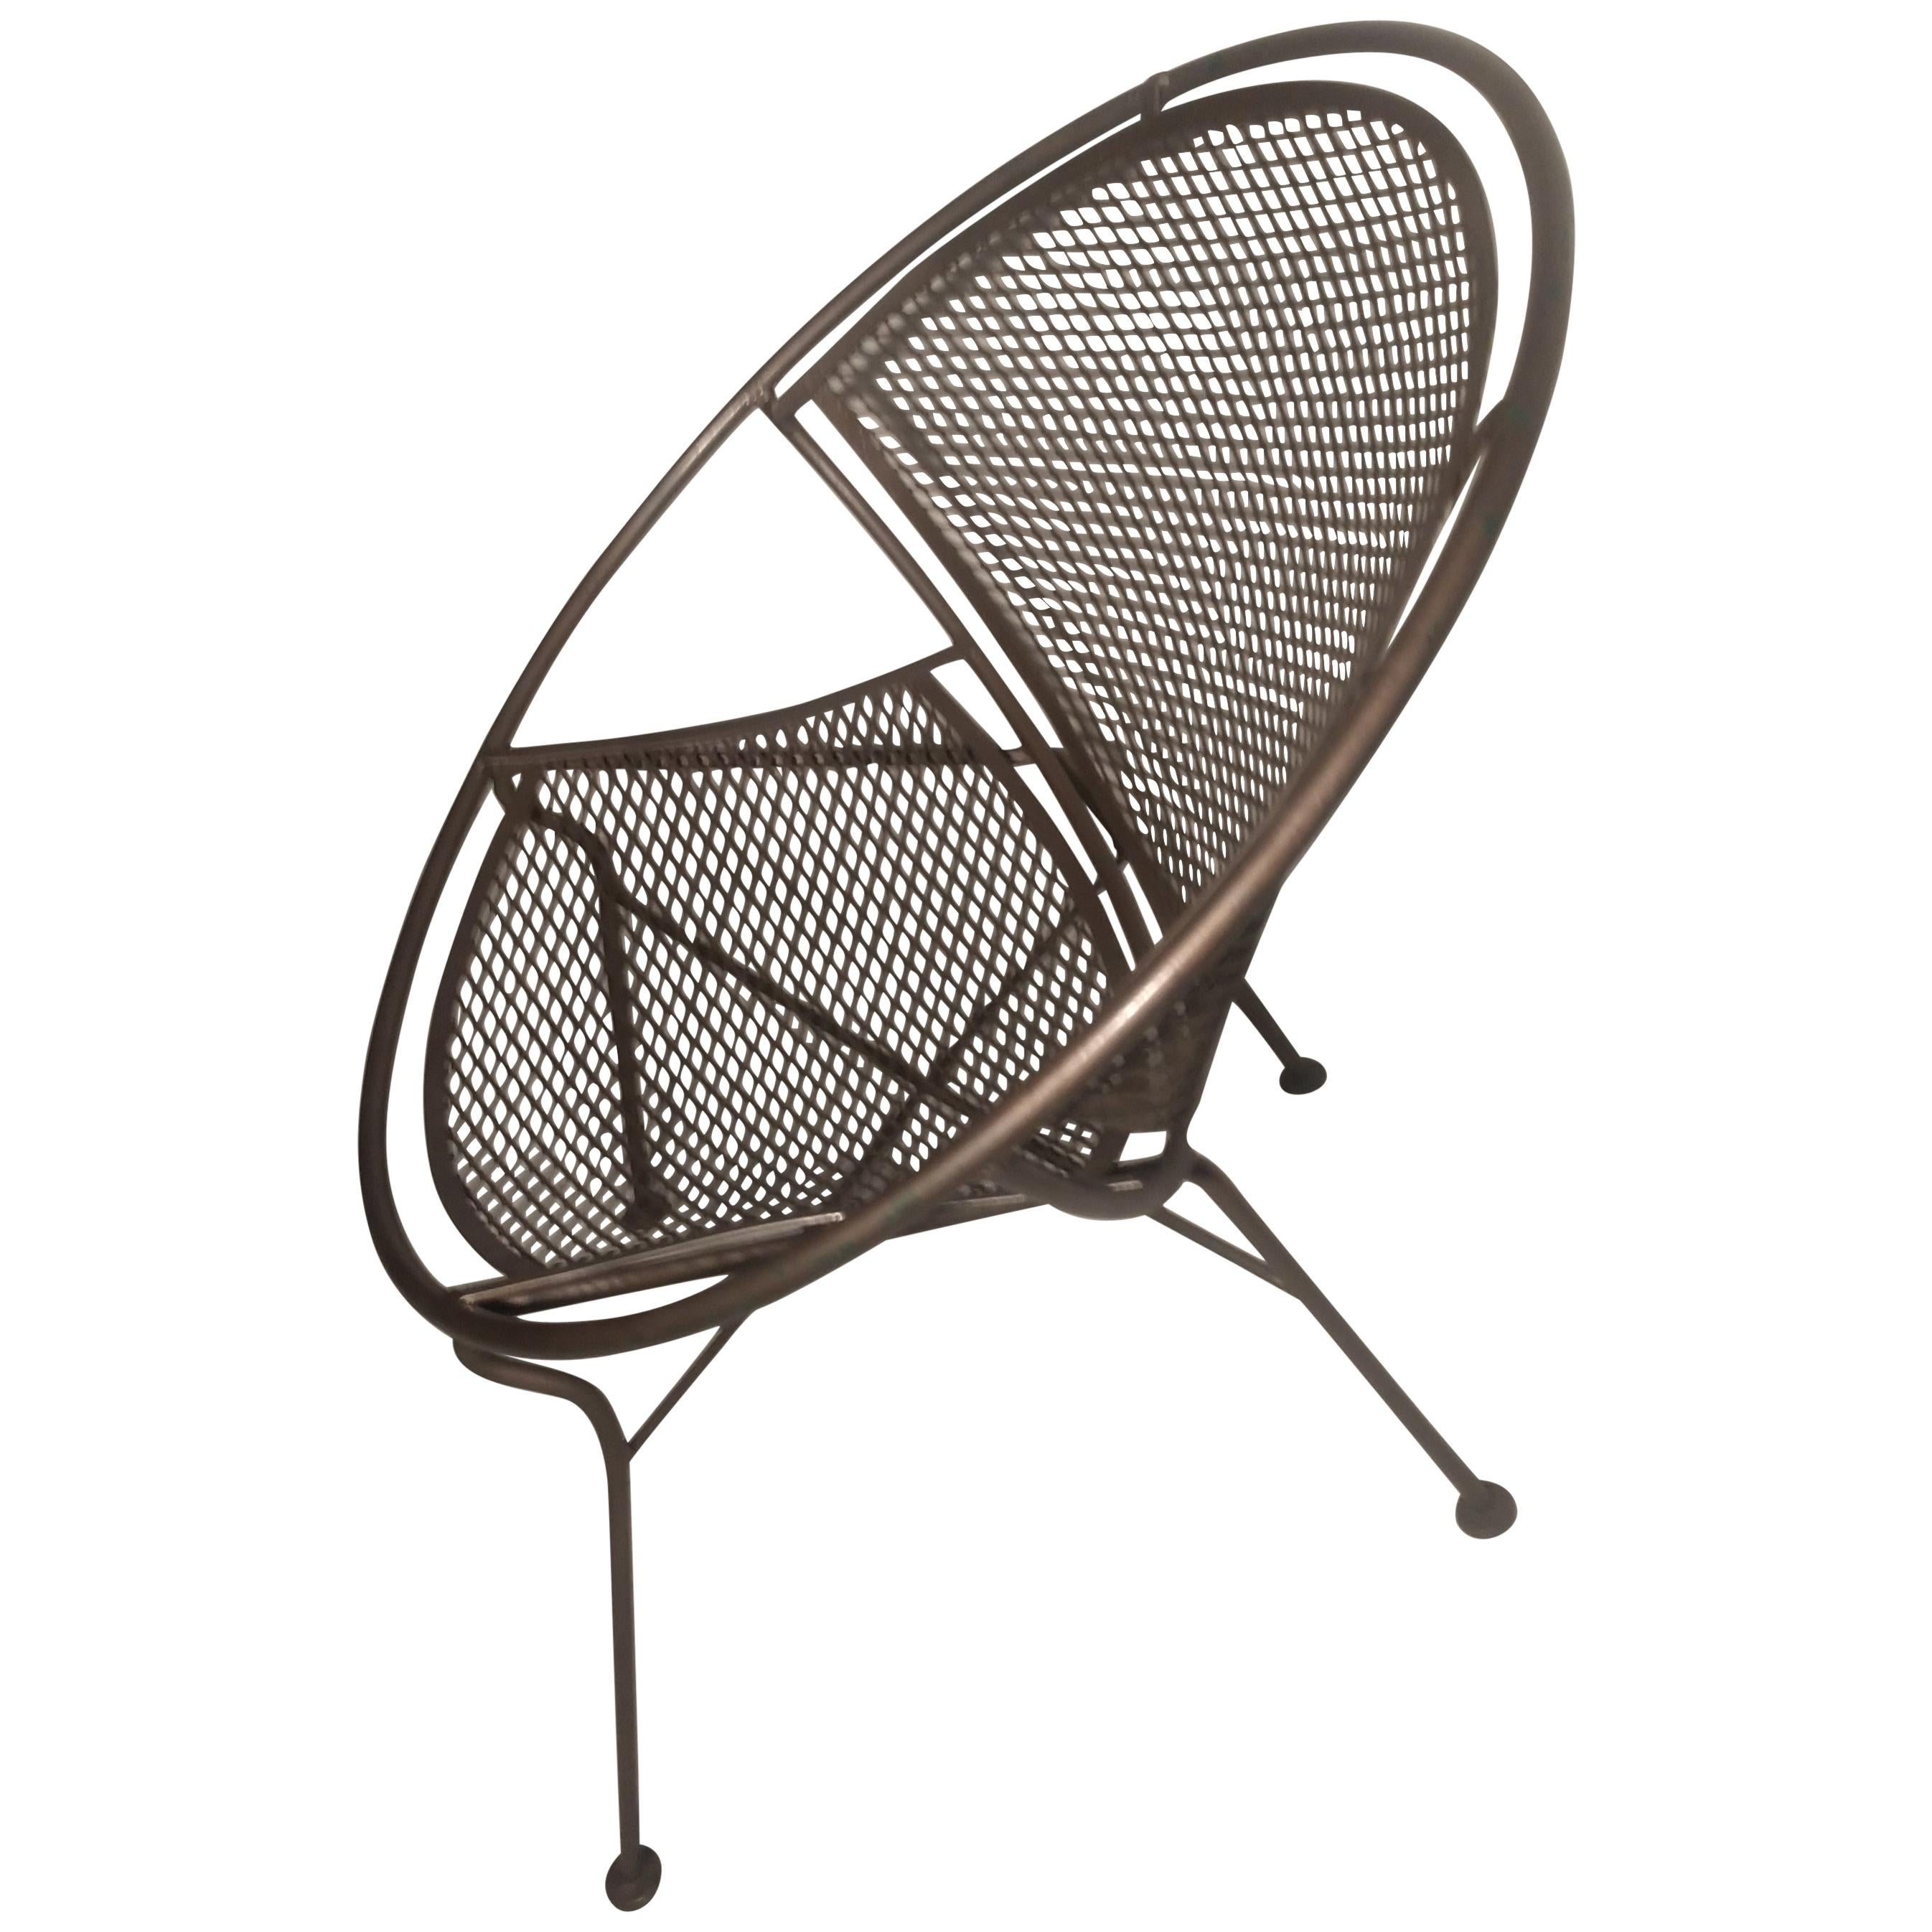 Mid-Century Modern Radar Saucer Lounge Chair by John Salterini